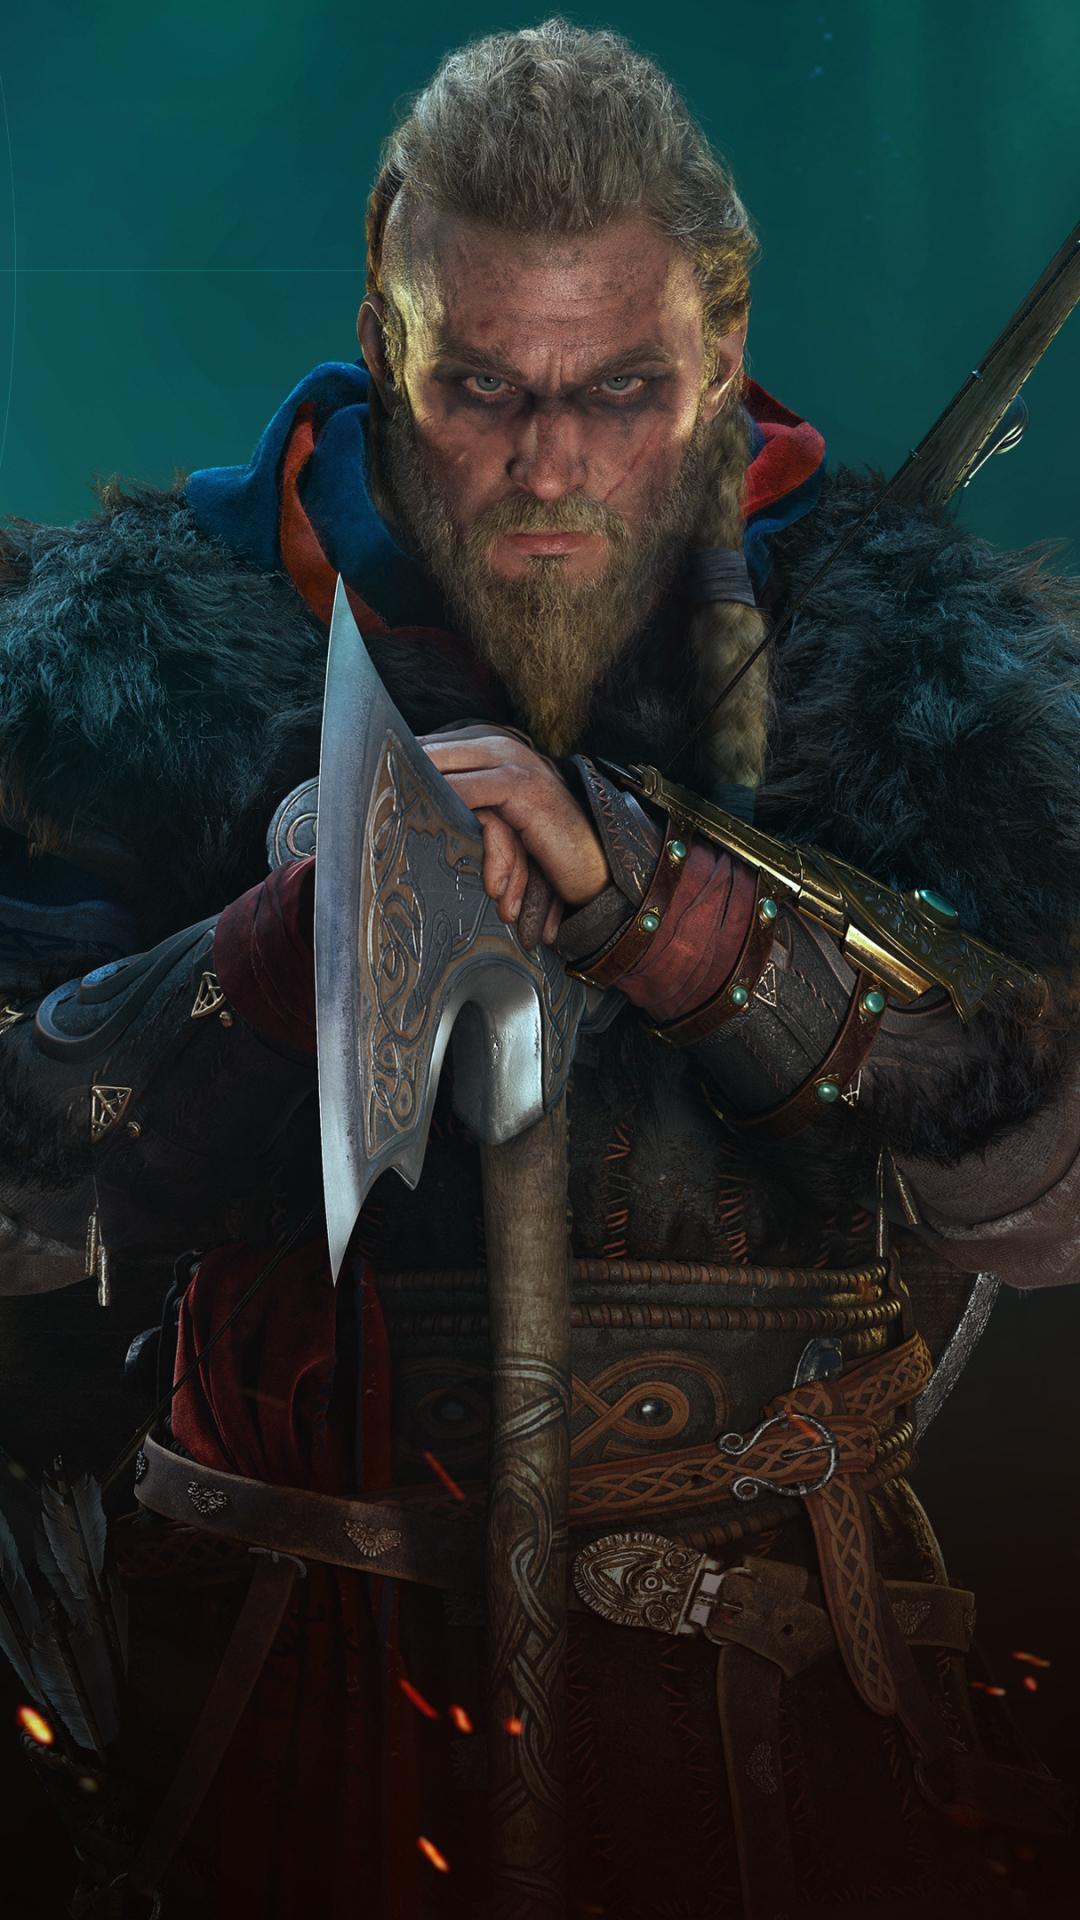 Assassin's Creed Valhalla Mobile Wallpaper